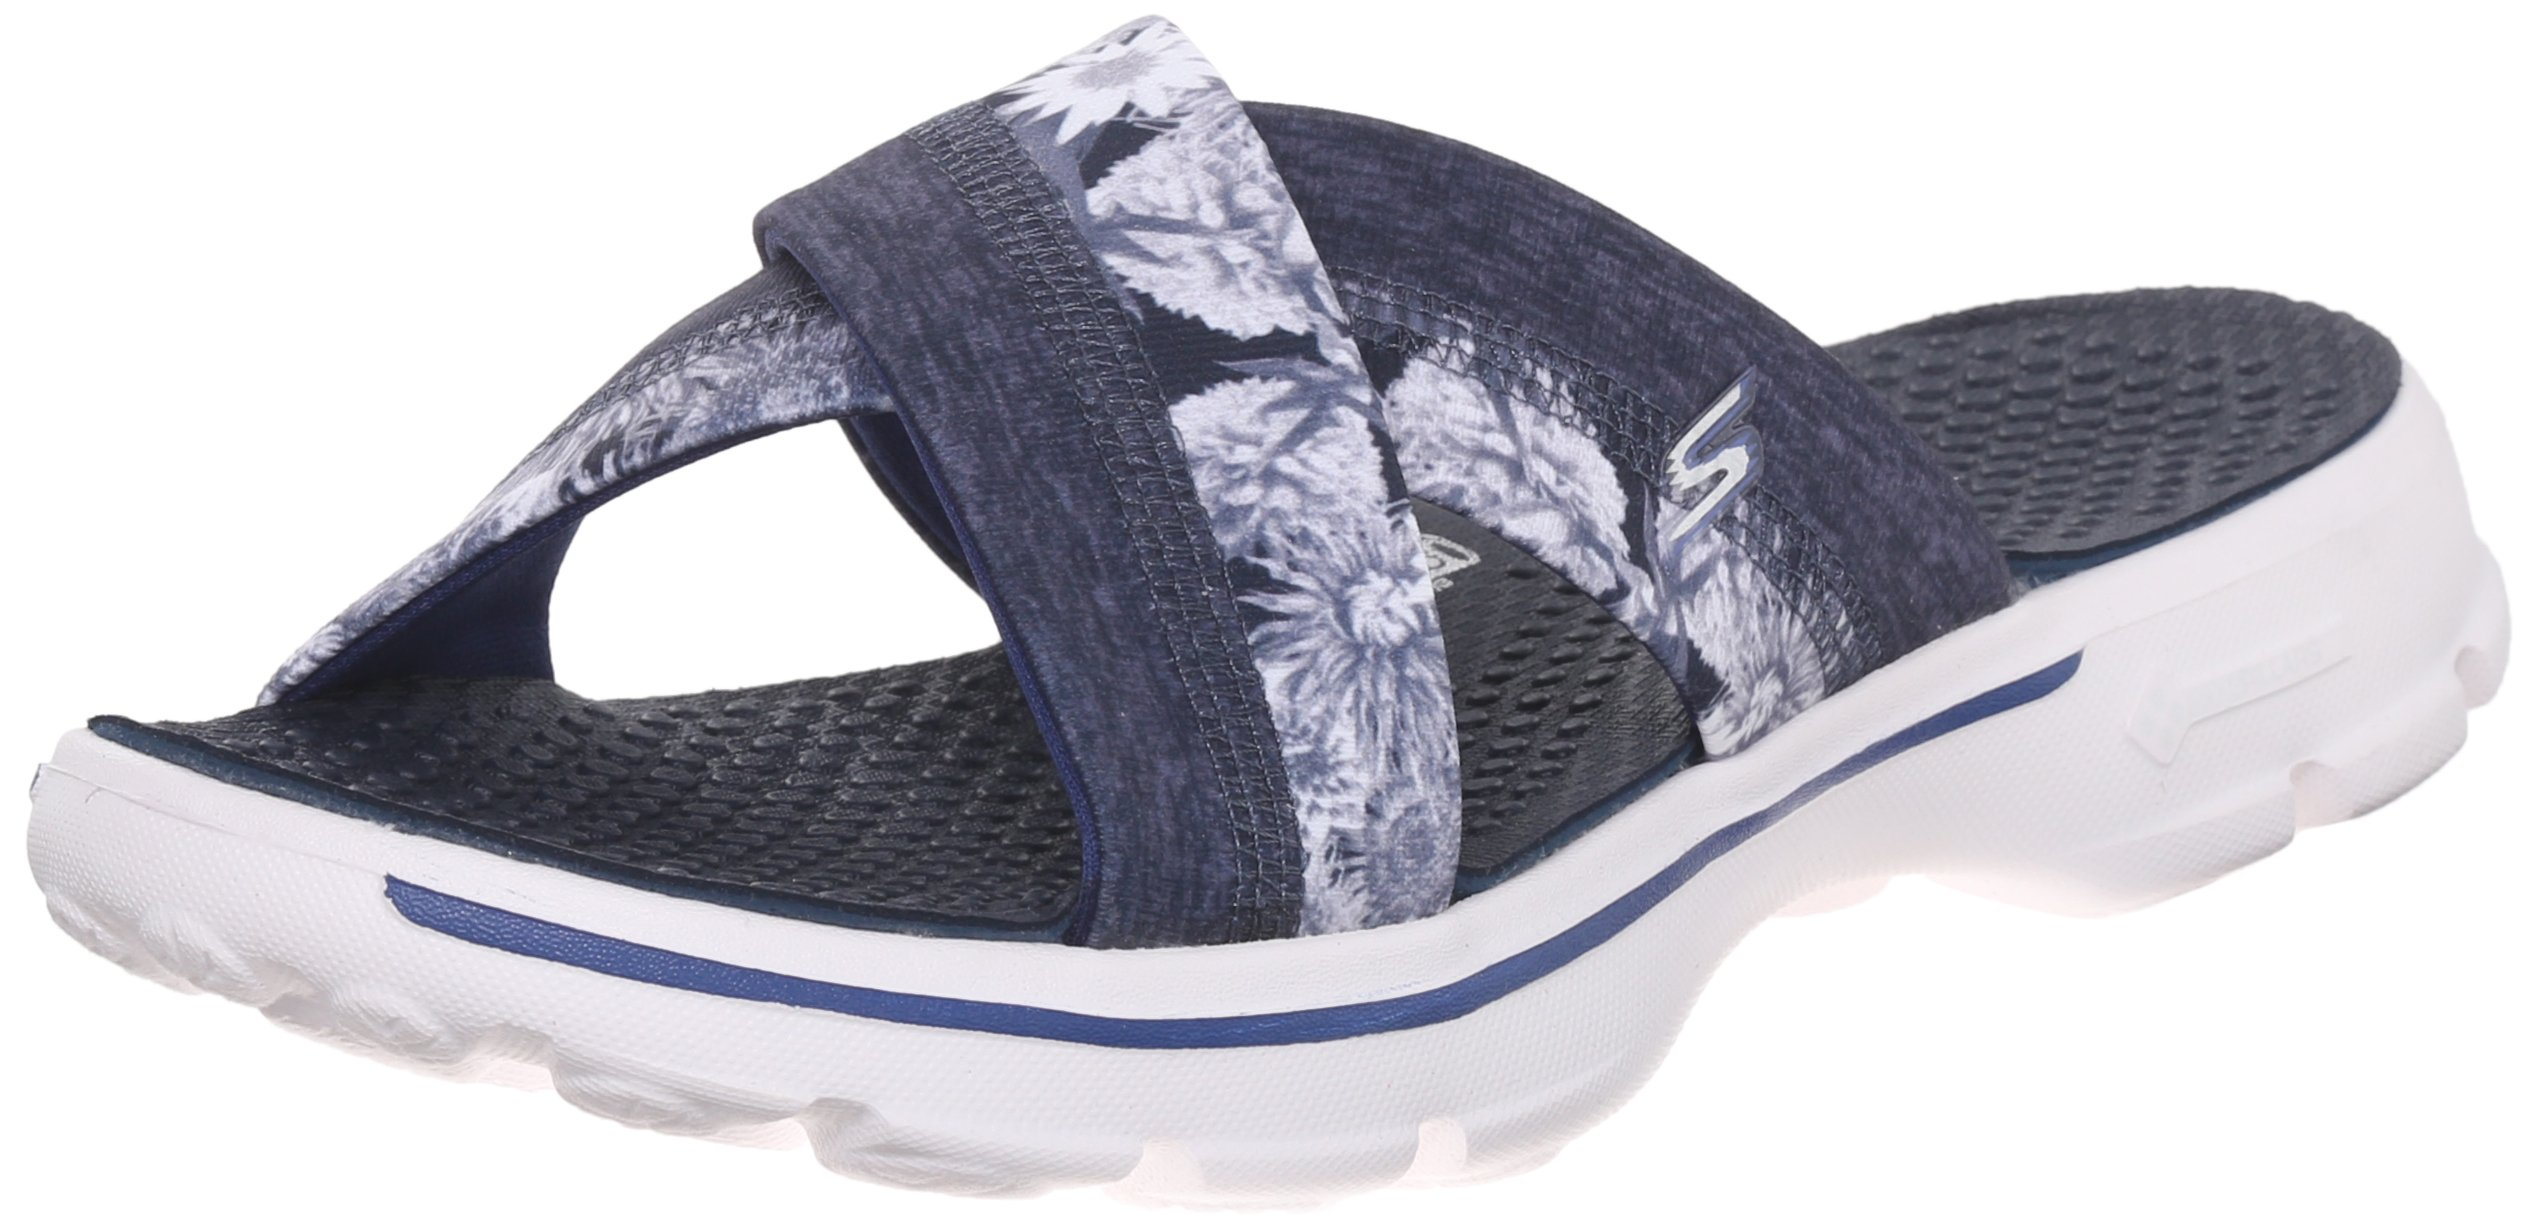 Walk Fiji Flip Flops